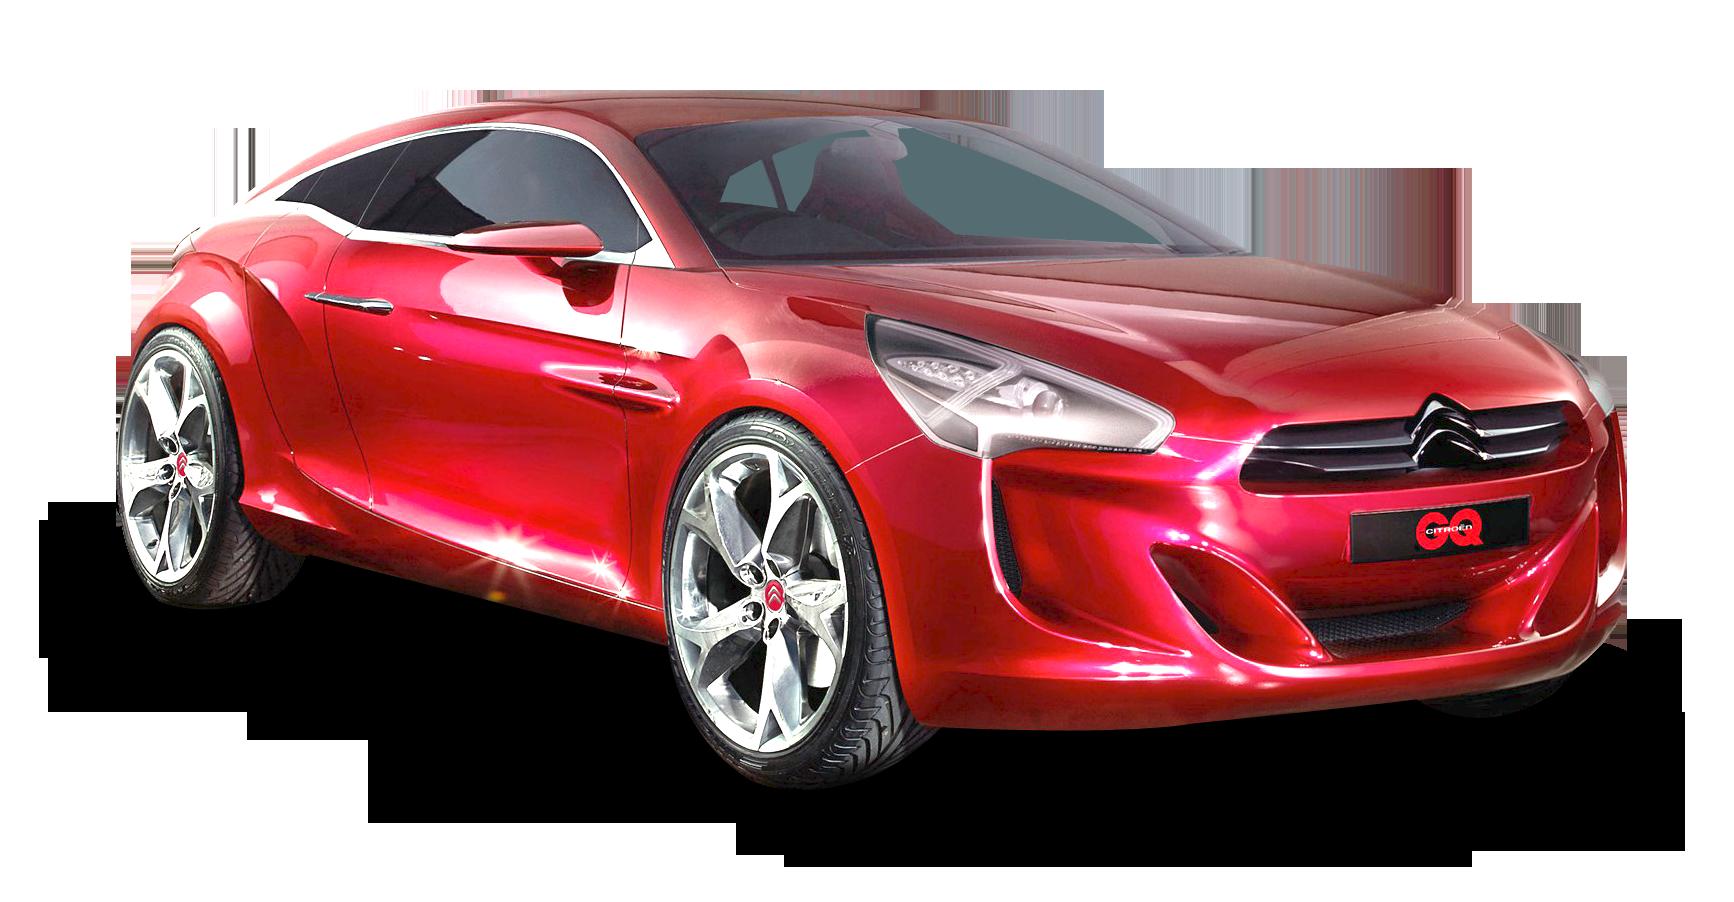 Red Citroen Car